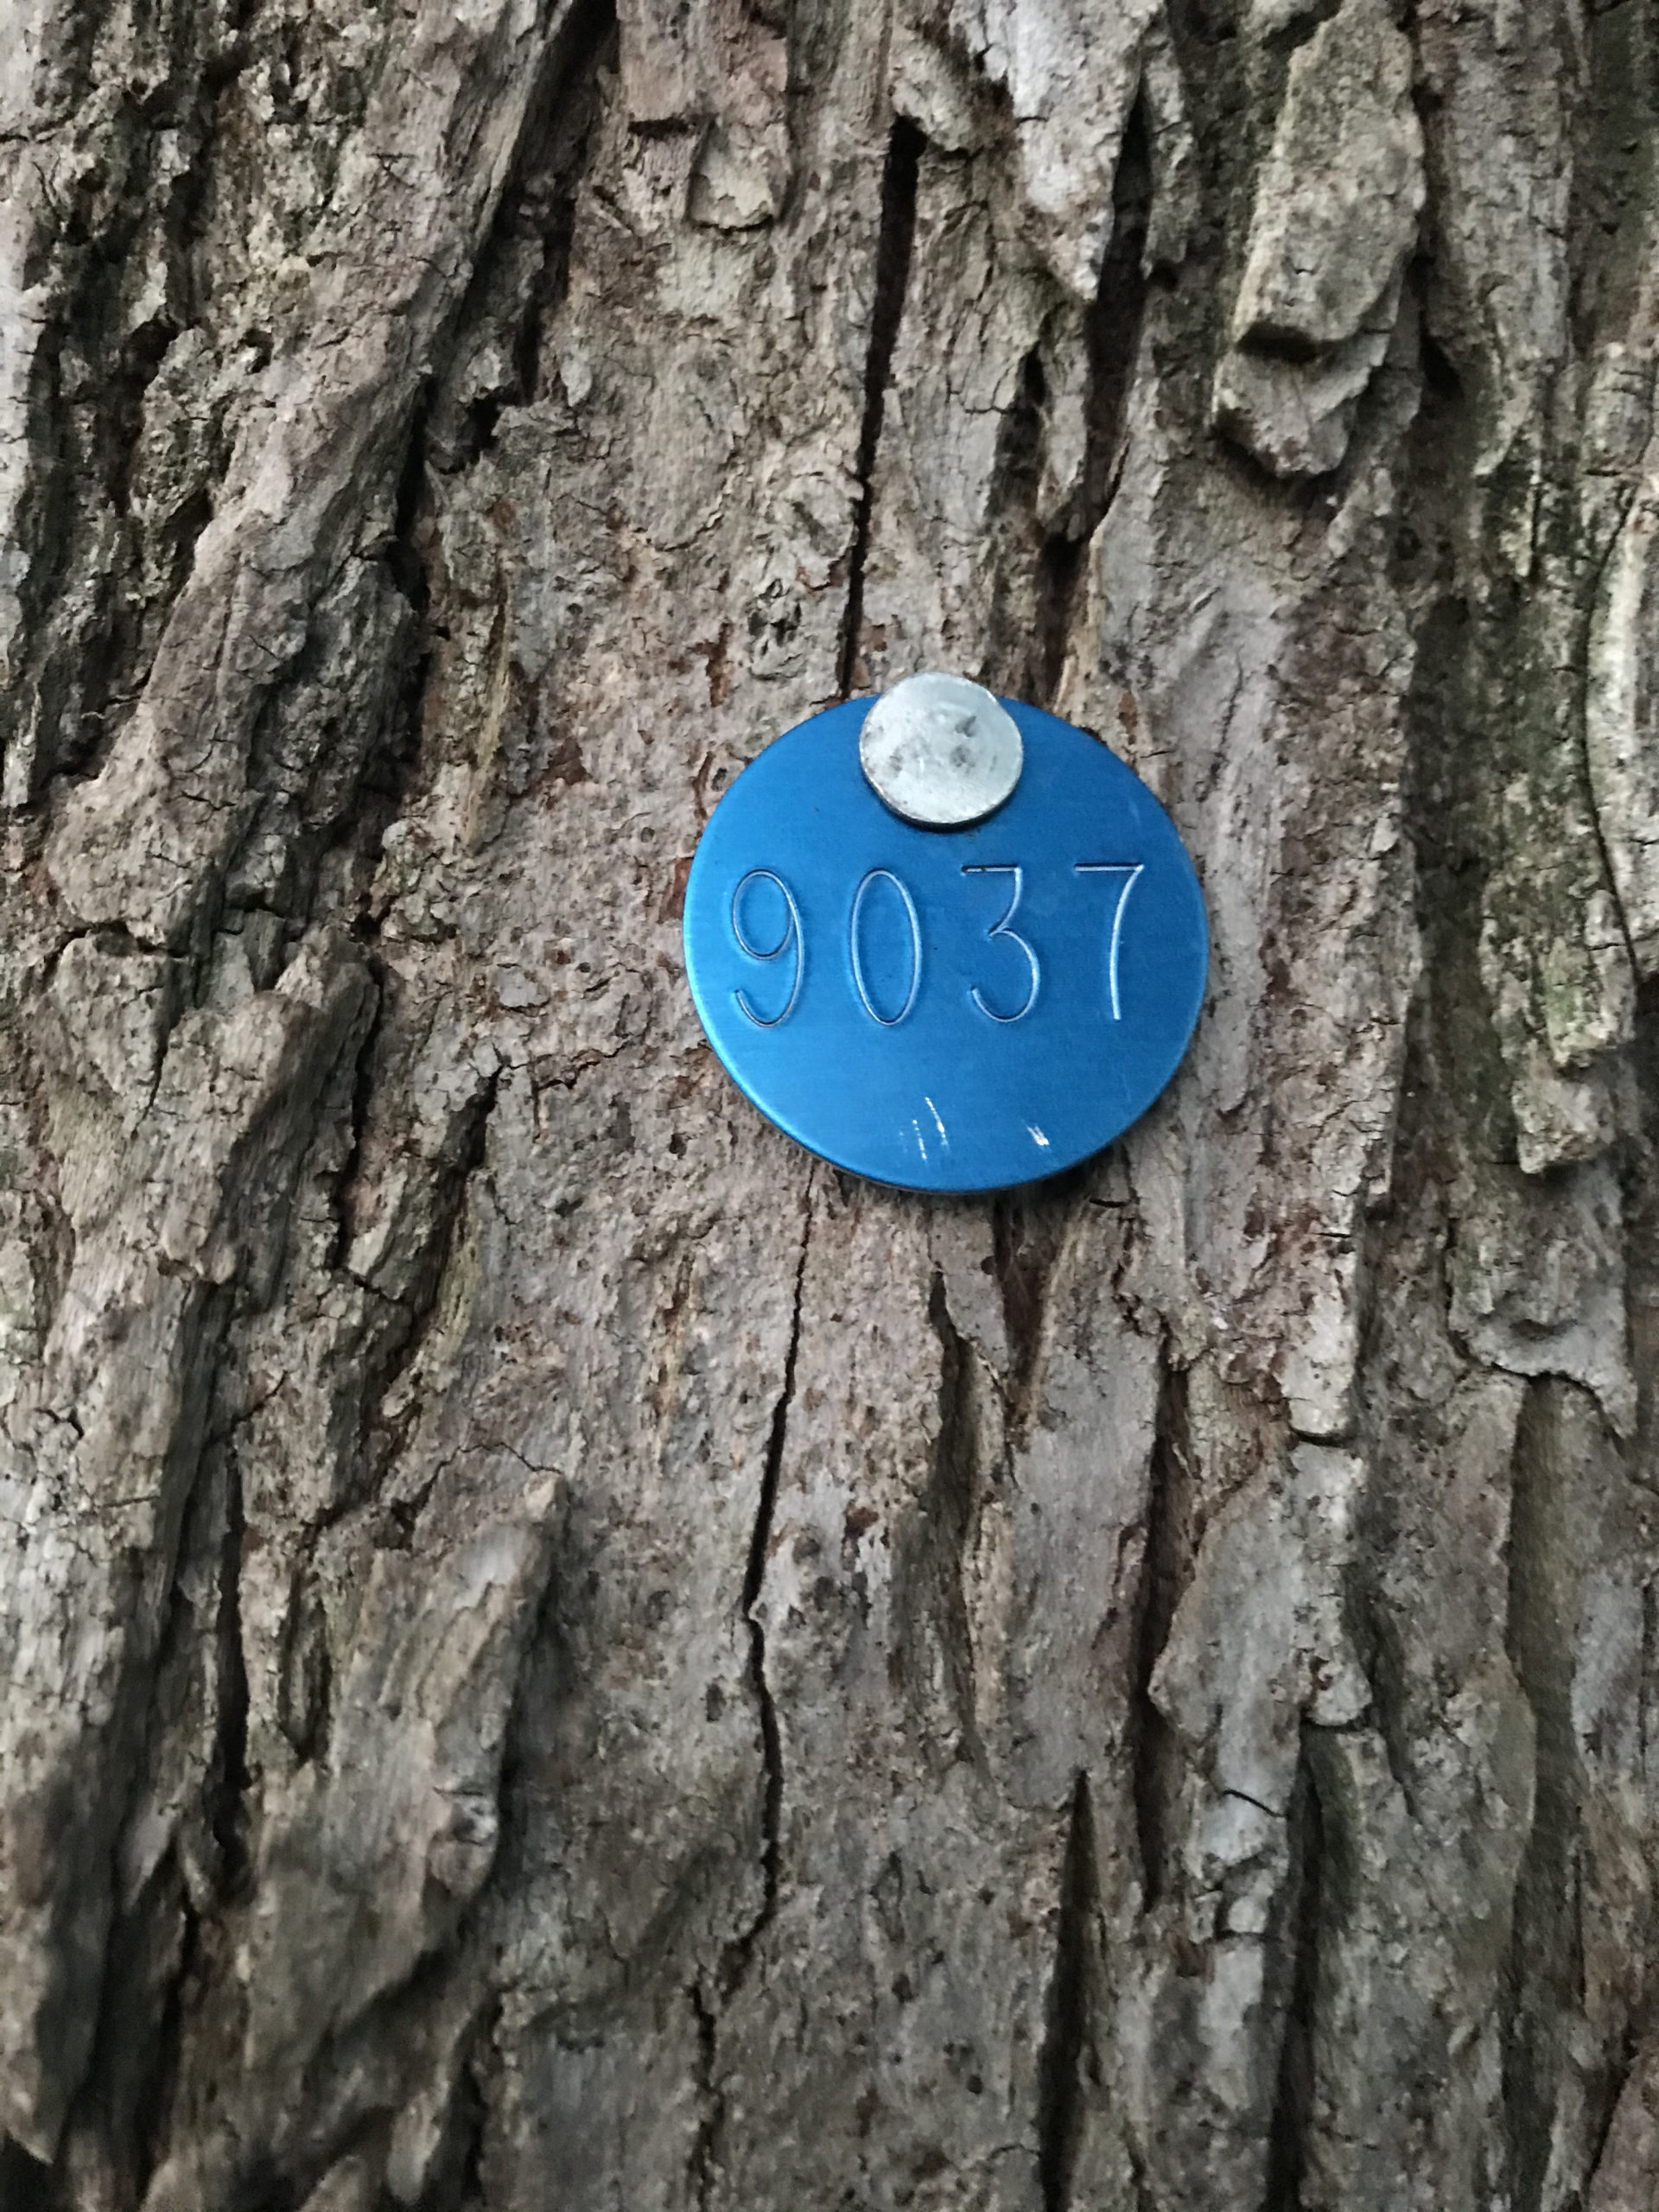 blue metal tag number 9037 on tree trunk